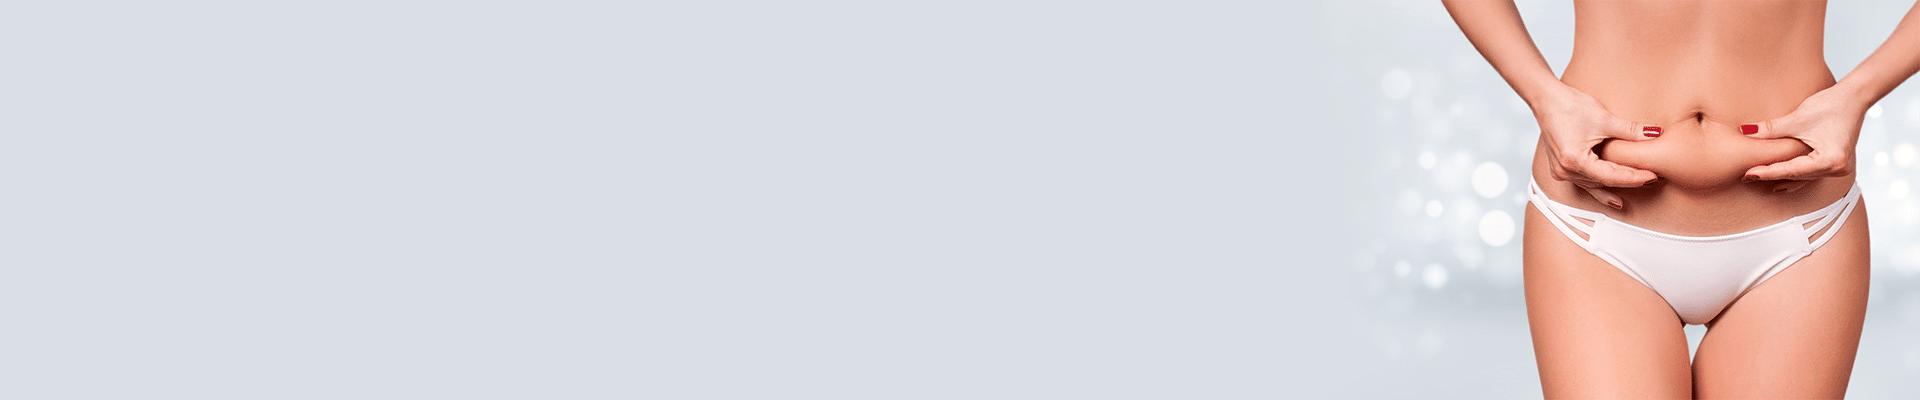 [:fr]Abdominoplastie Nabeul Prix : Chirurgie reparatrice ventre tout compris[:ar]جراحة شد البطن نابل السعر: جراحة شاملة لإصلاح البطن[:]